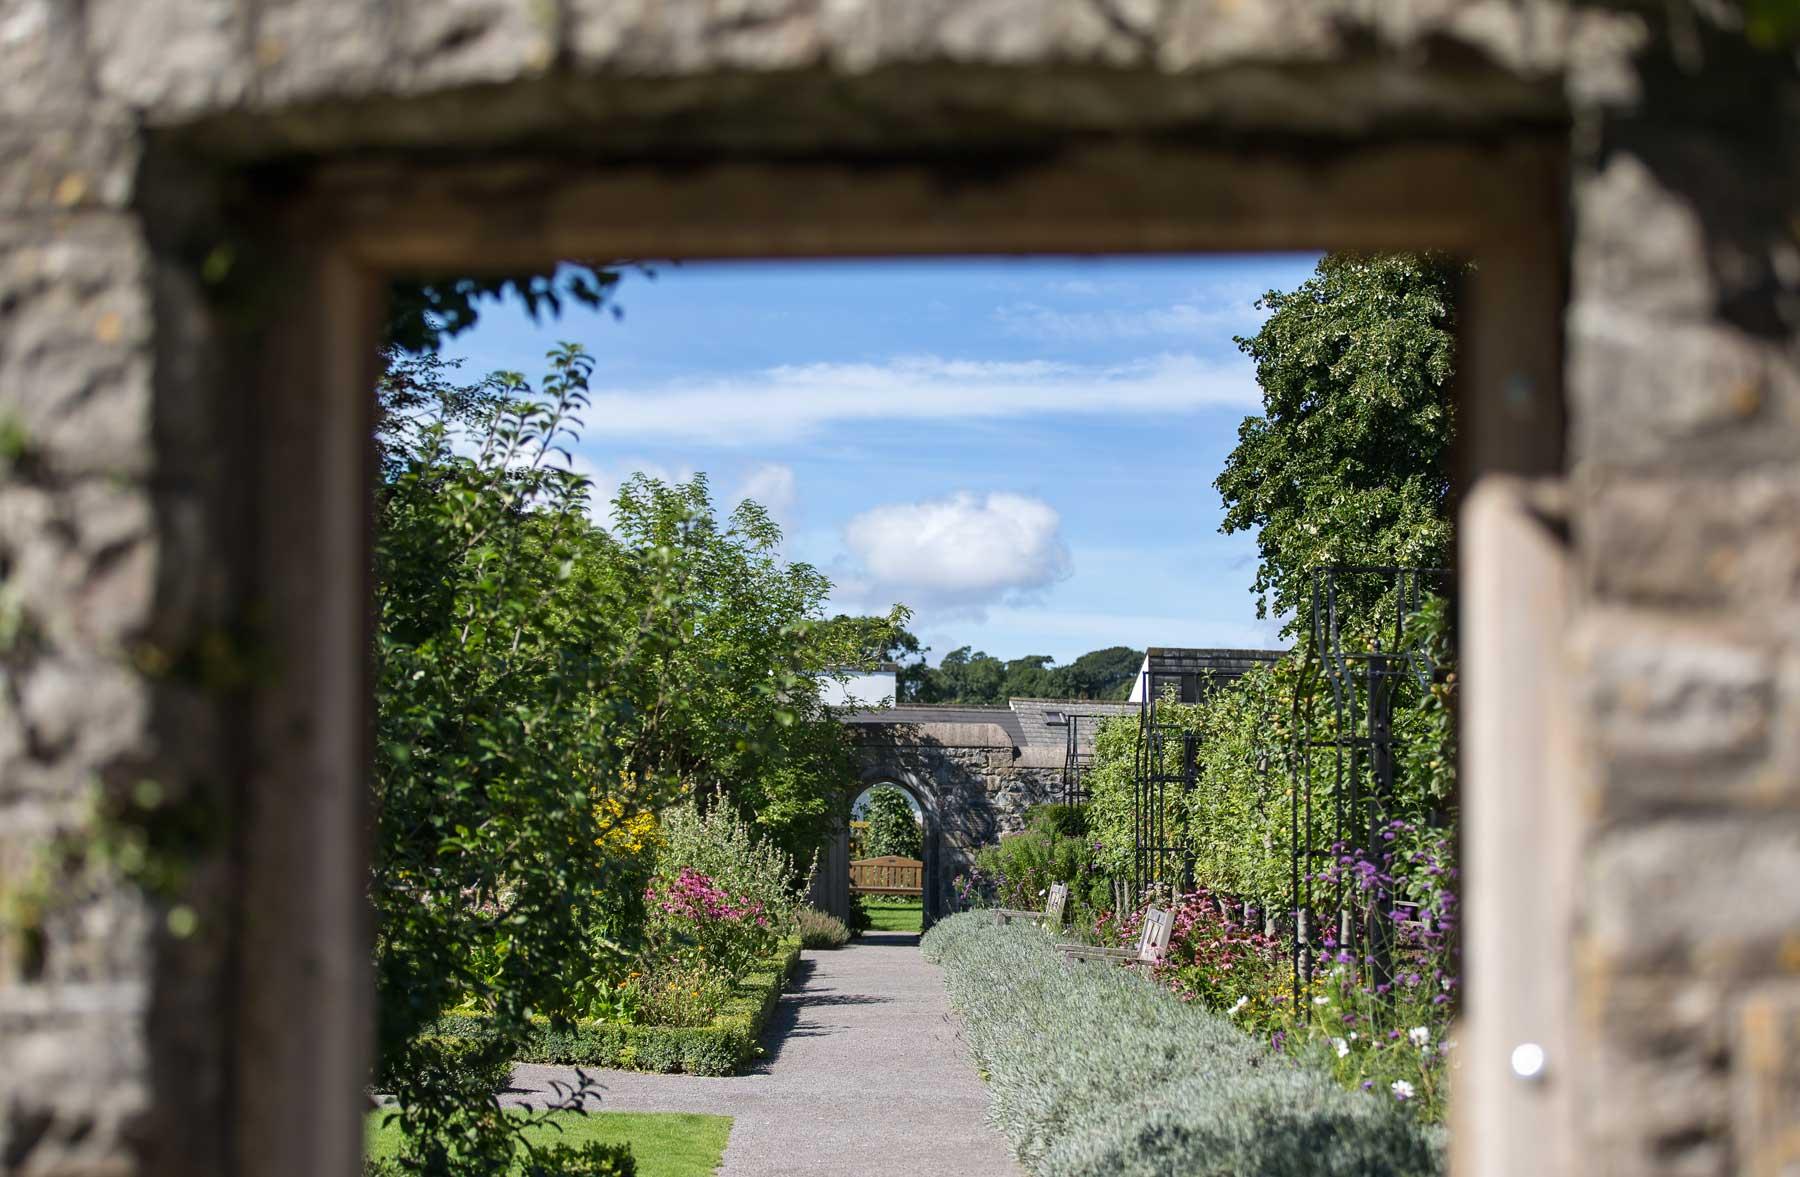 The Physic Gardens in Cowbridge